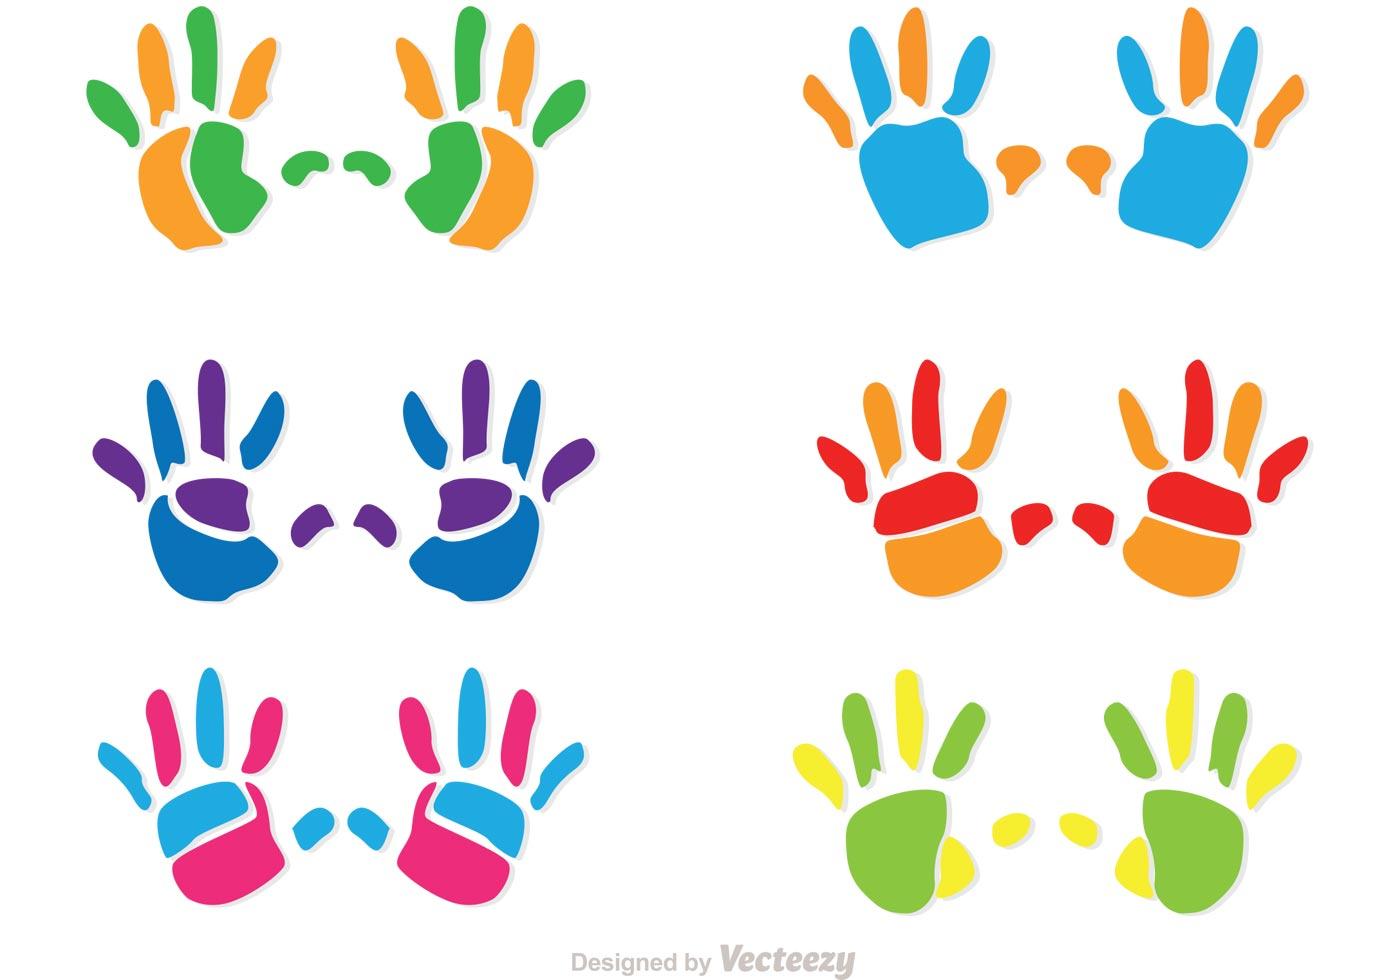 Colorful Child Handprint Vectors Download Free Vector